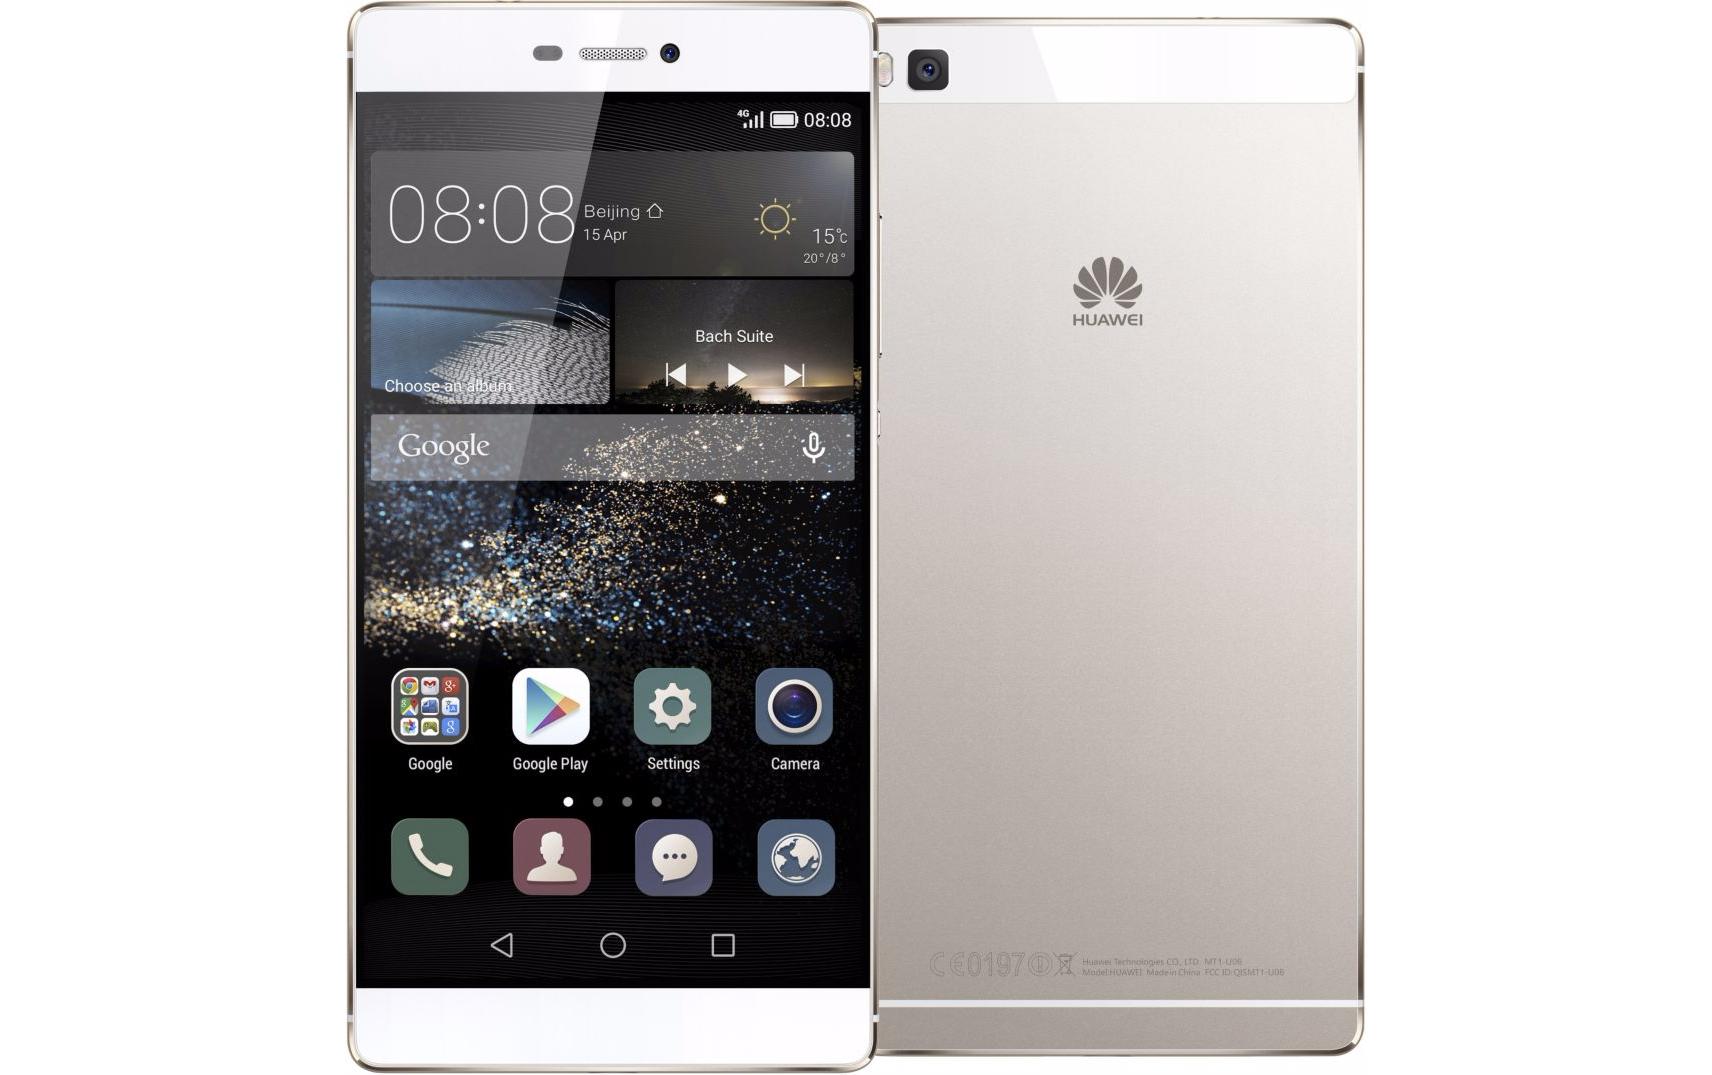 Bon plan : Le Huawei P8 à 299 euros au lieu de 369 euros